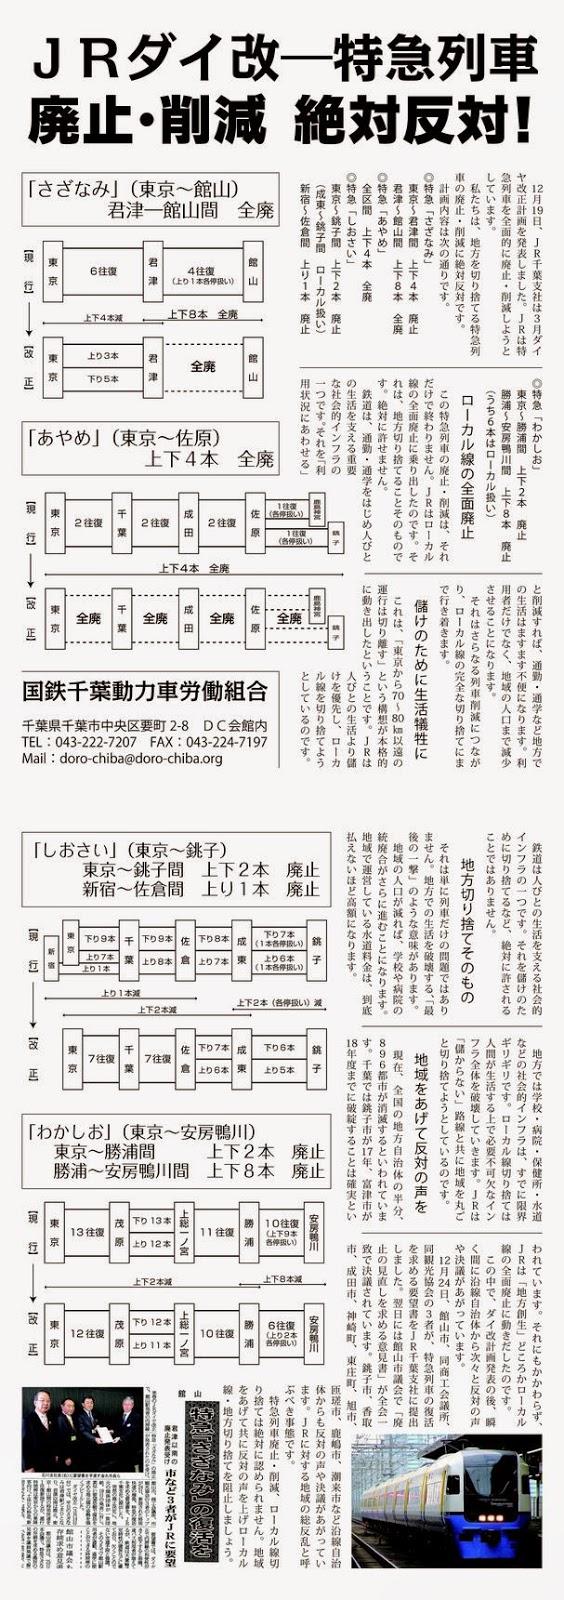 http://www.doro-chiba.org/pdf/2015daikaibira.pdf